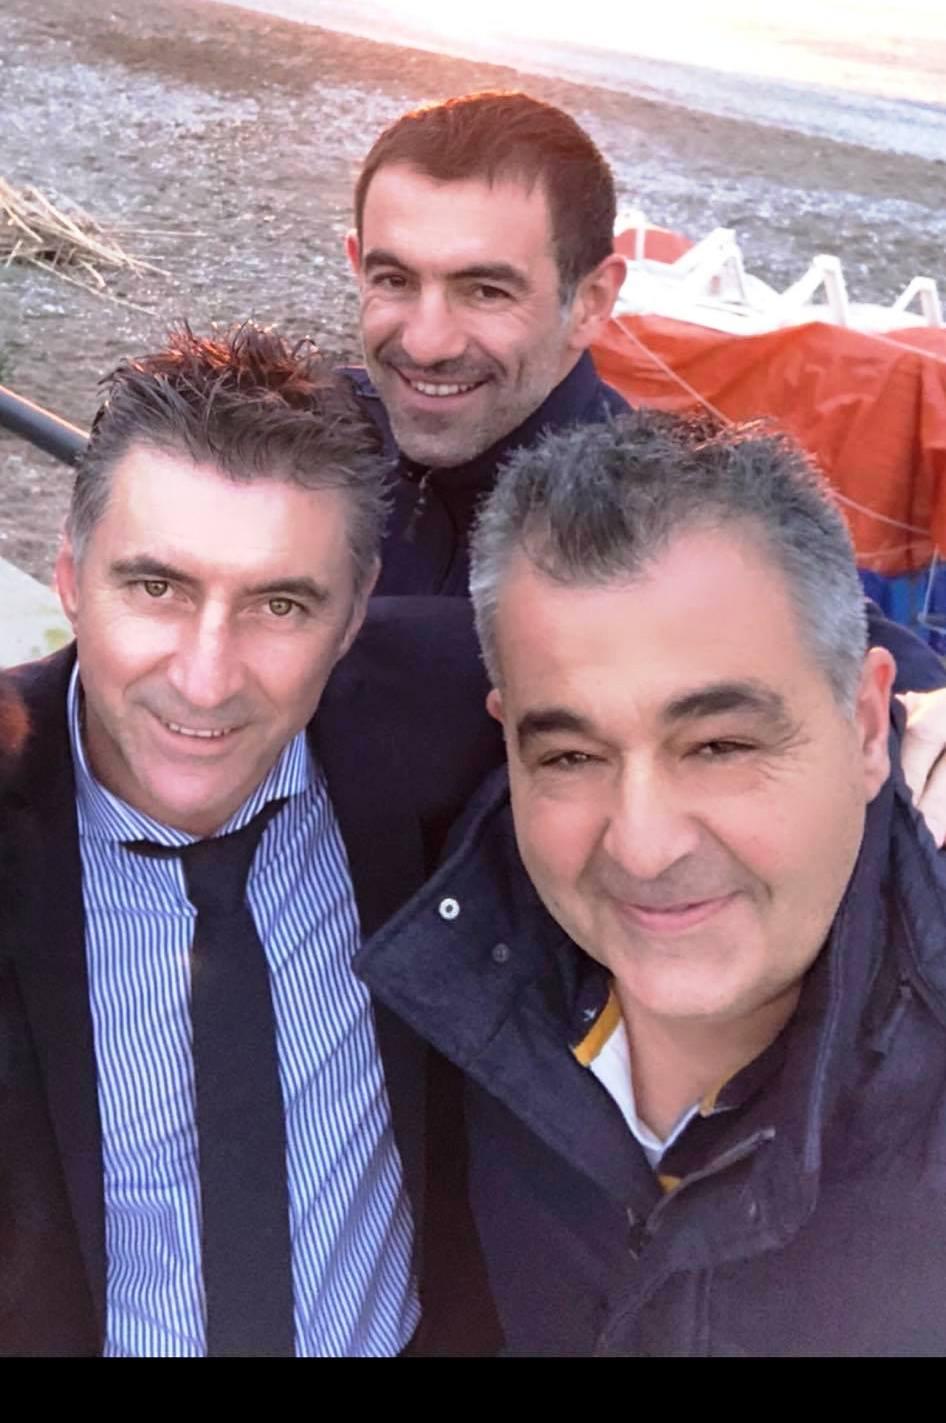 video- Ο Παναγιώτης Διακοφώτης για την επιστροφή στην αγωνιστική δράση και για τις εκλογές στην ΕΠΟ